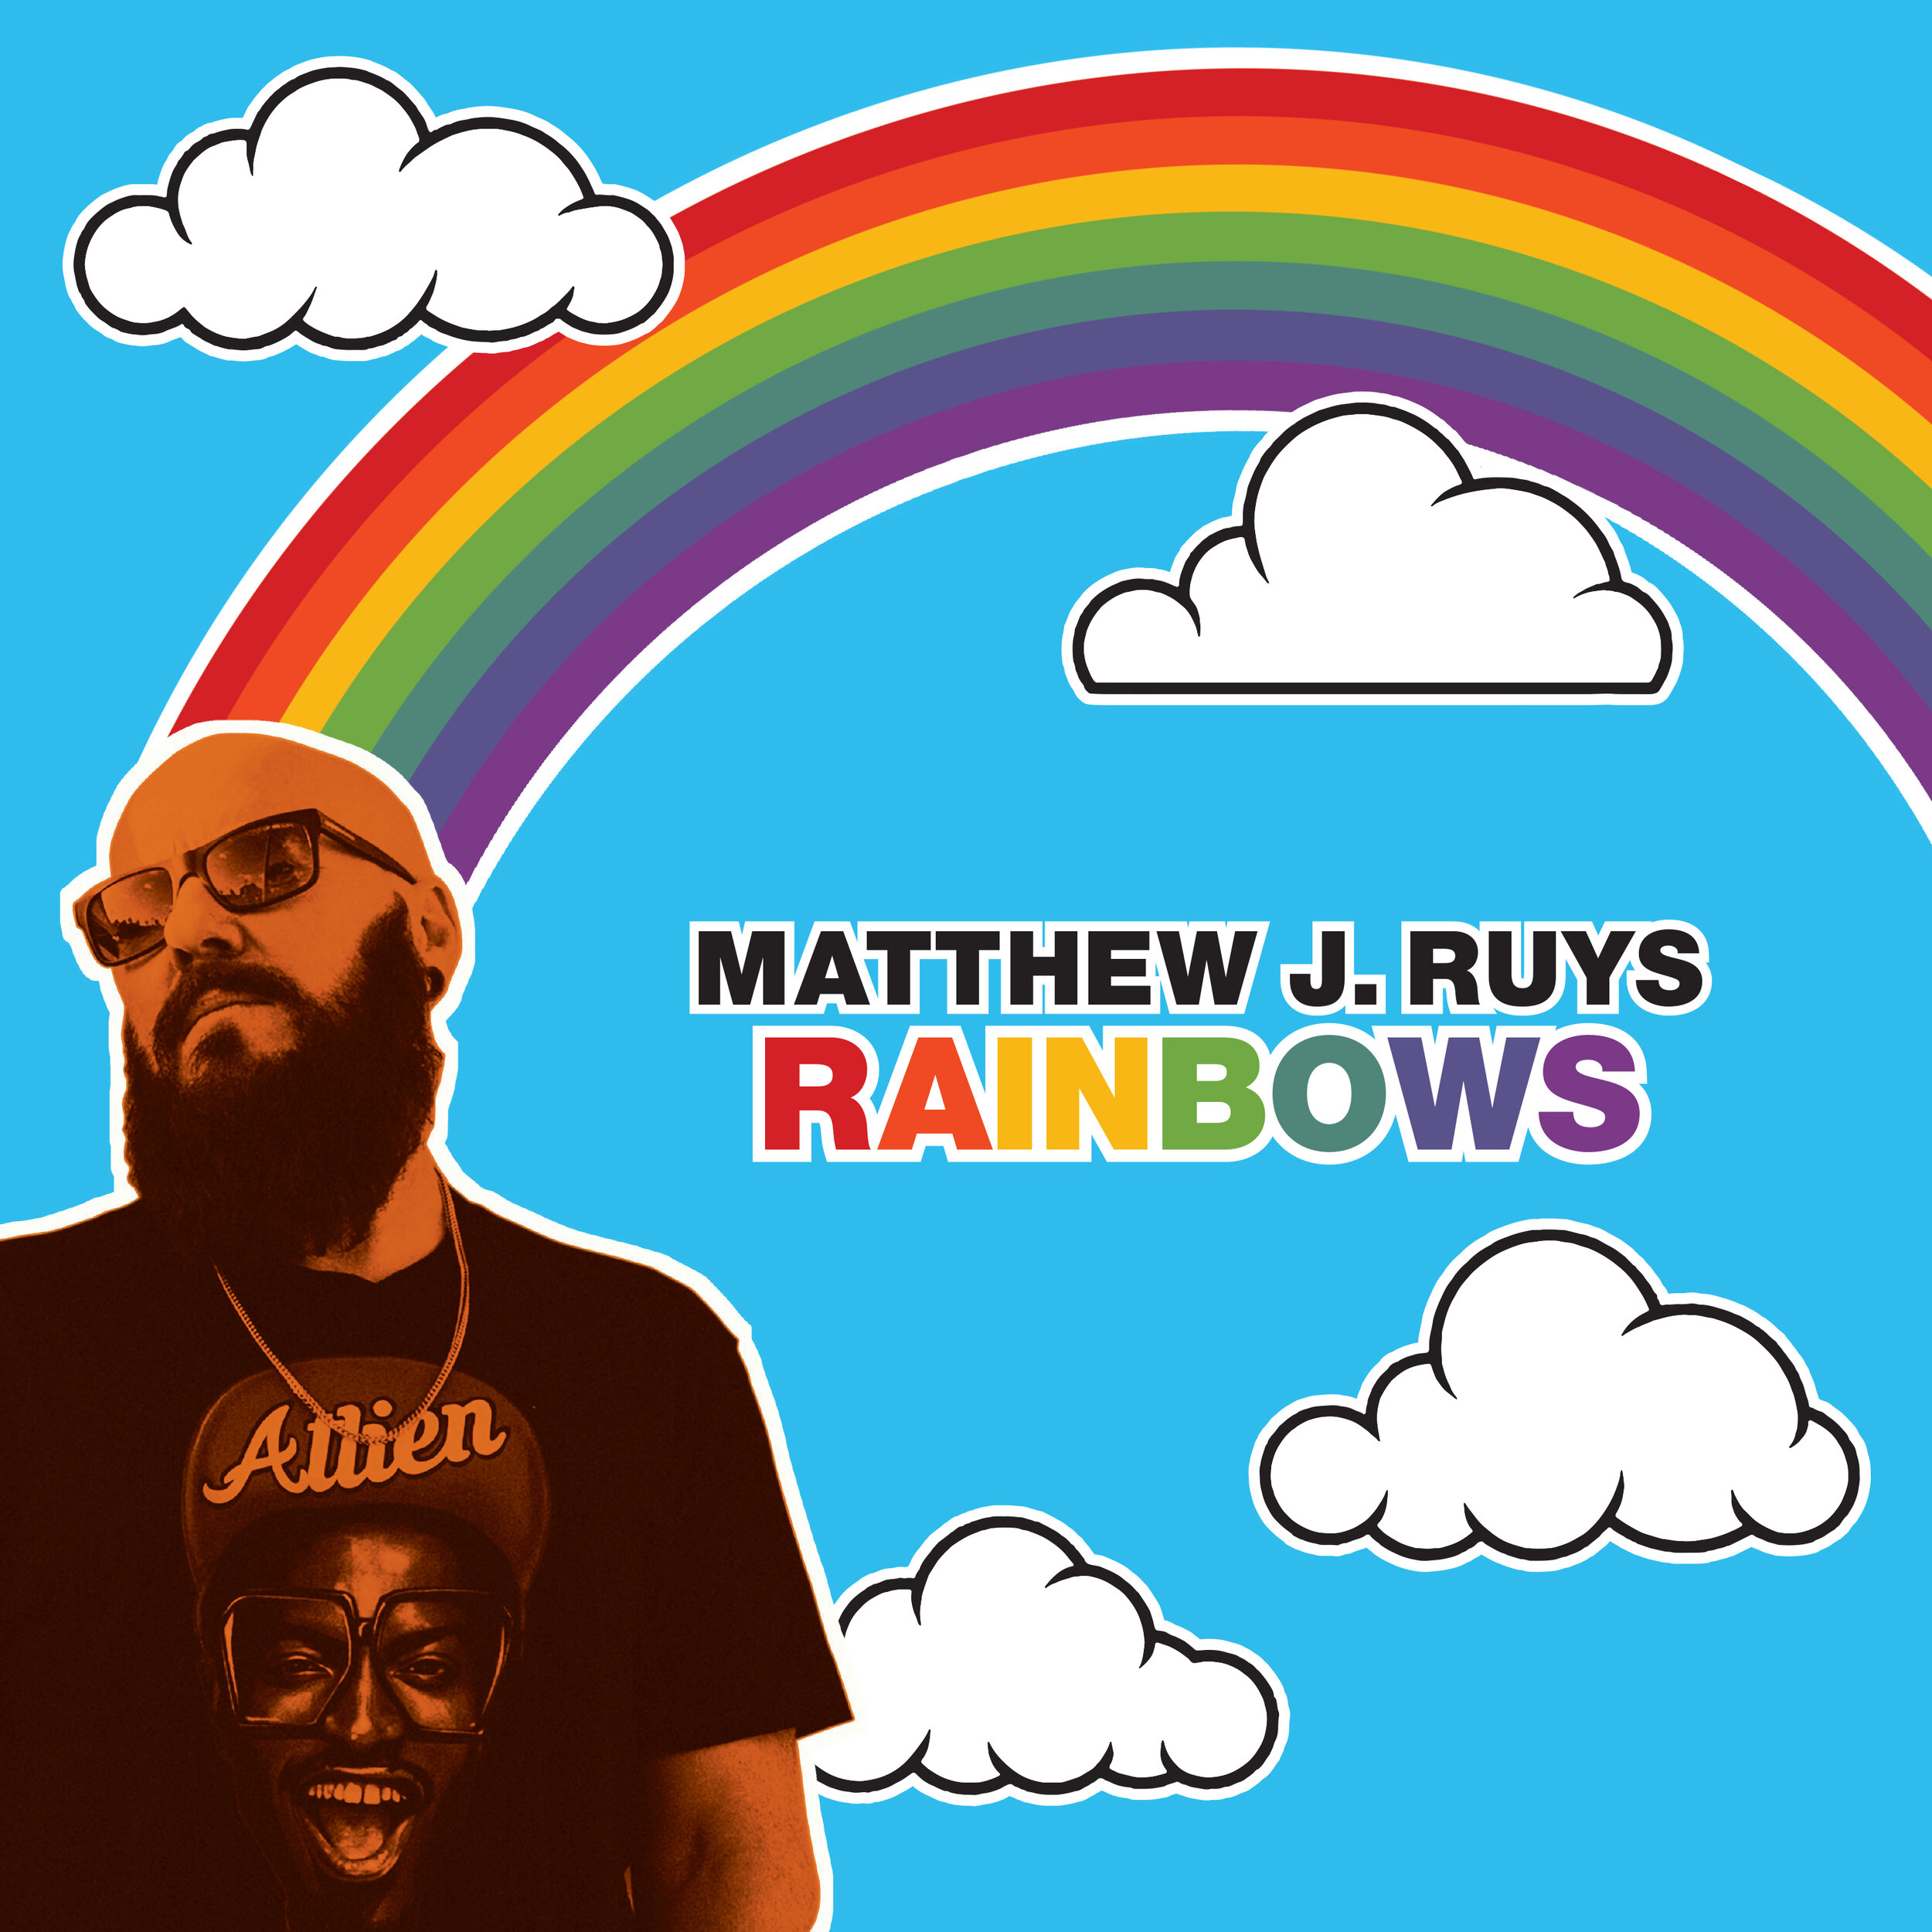 Matthew J. Ruys 'In Rainbows' Single